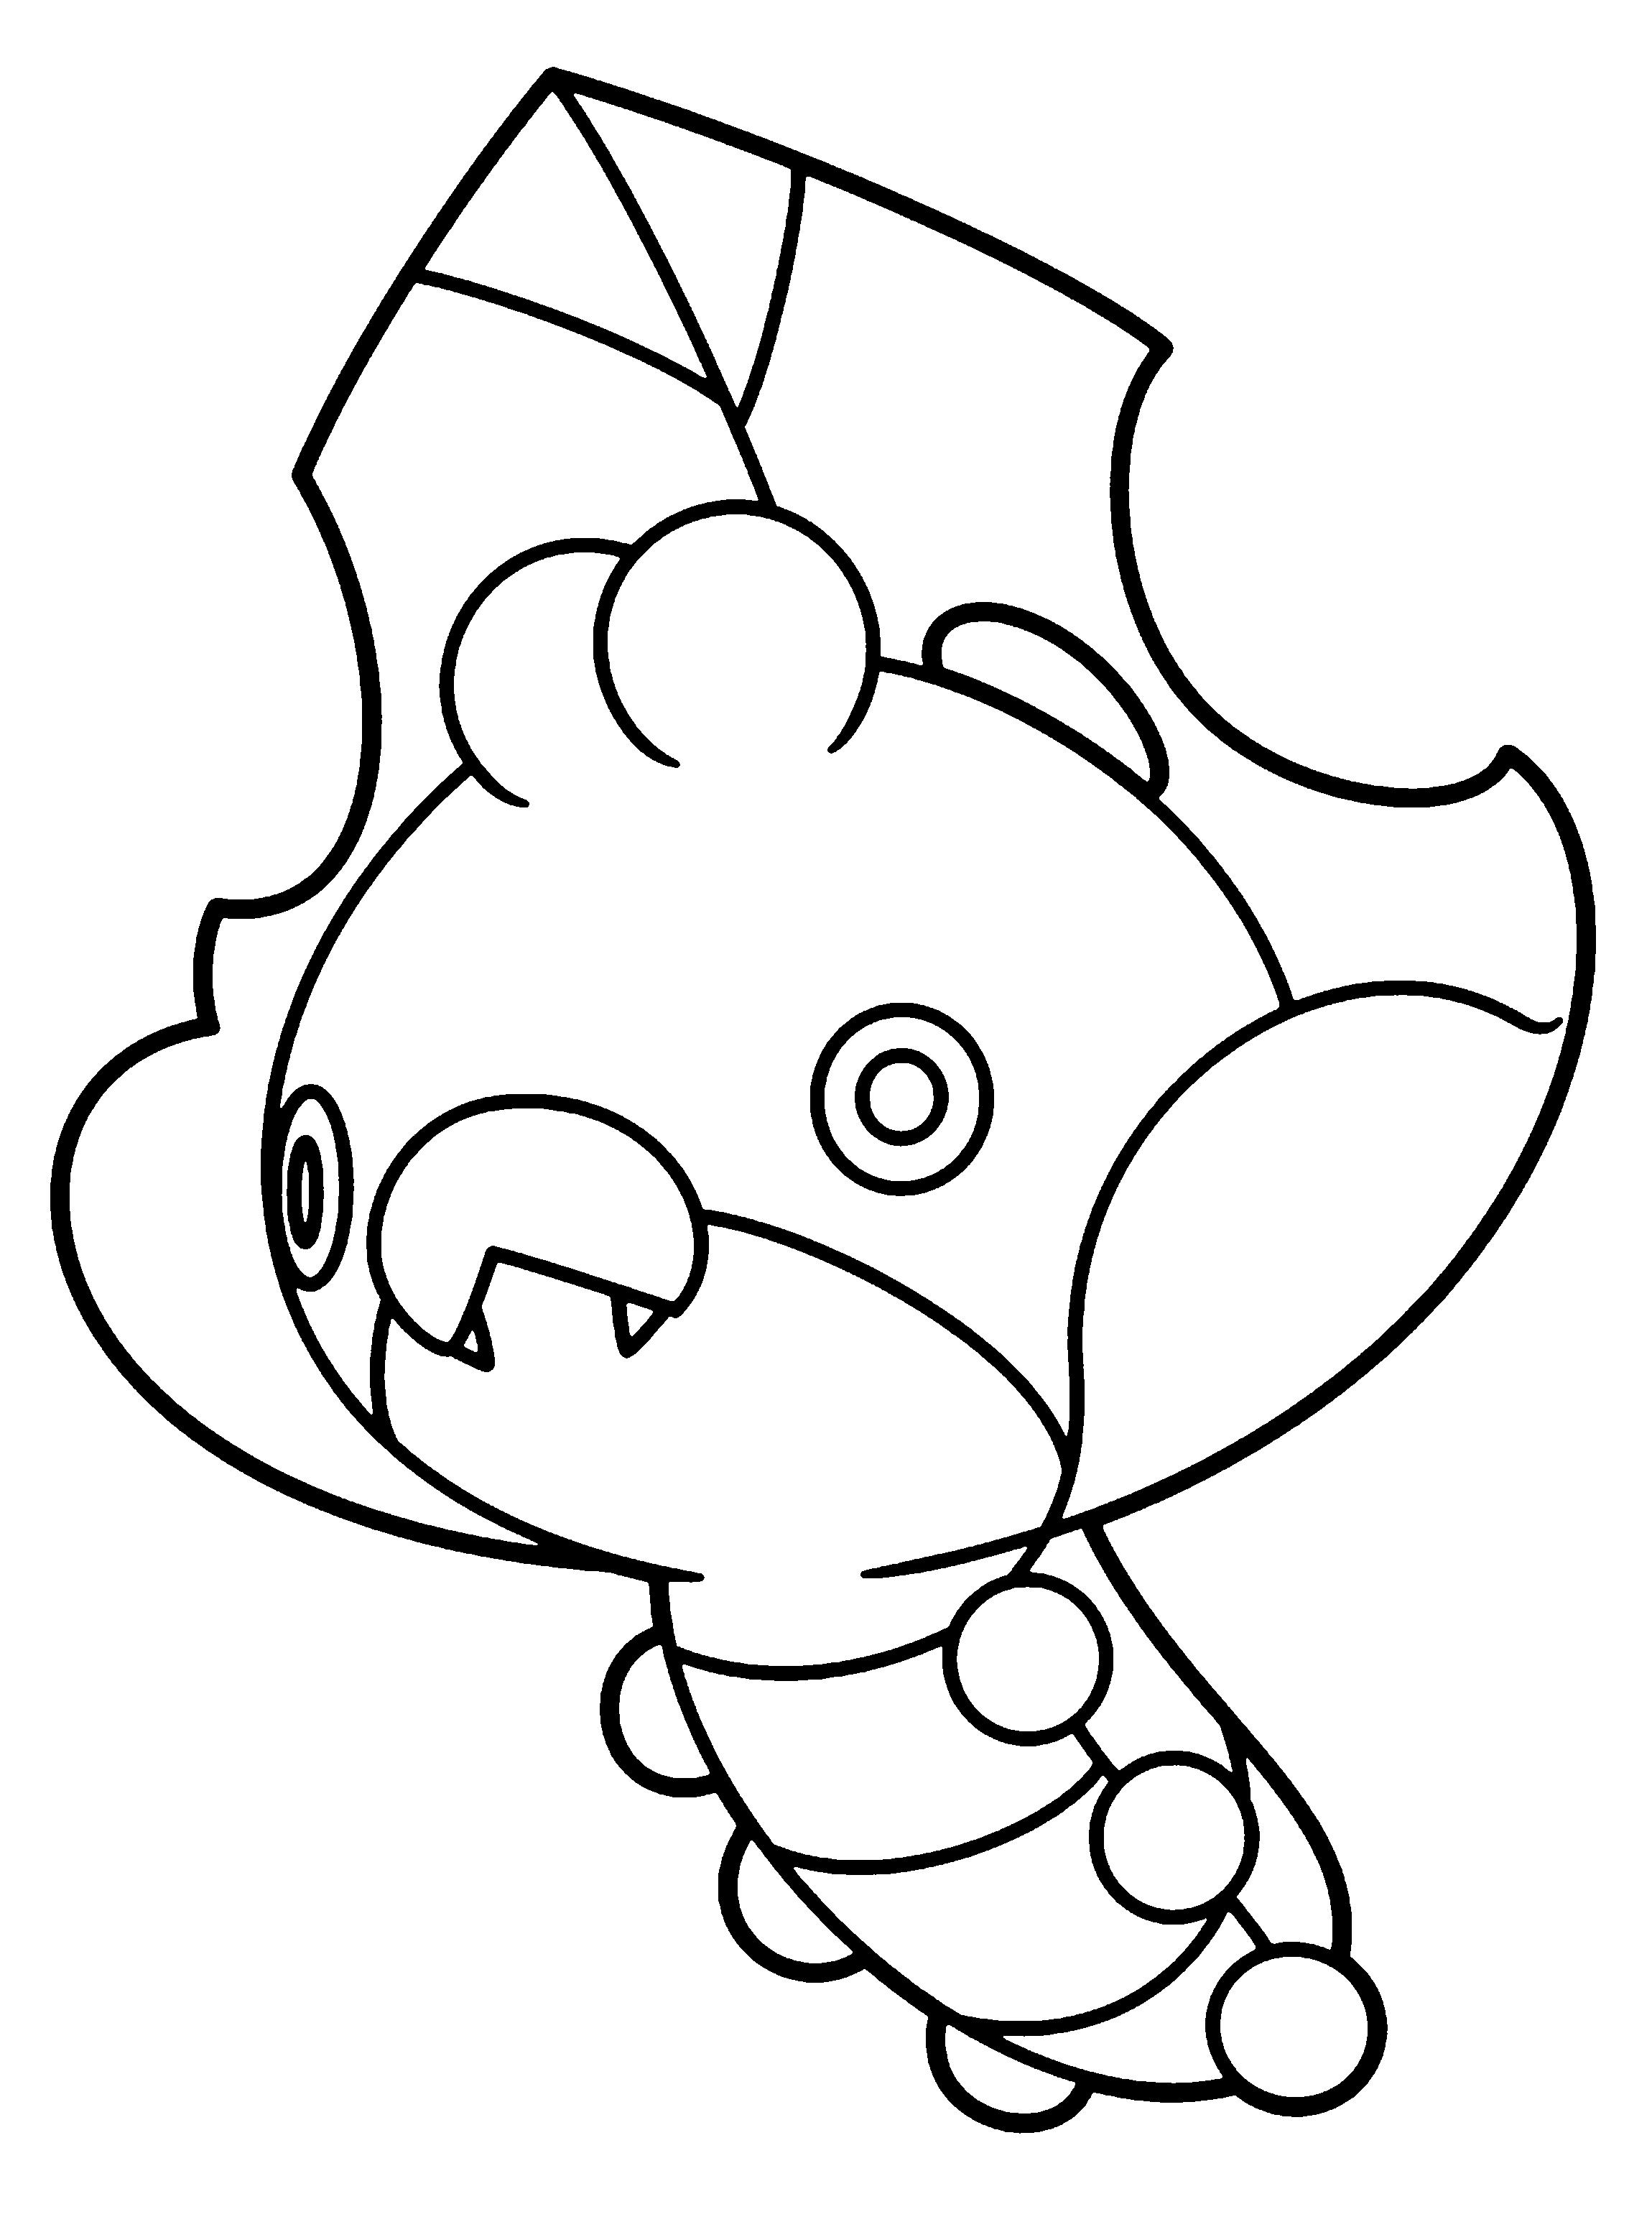 malvorlage  pokemon black ausmalbilder vnkkb